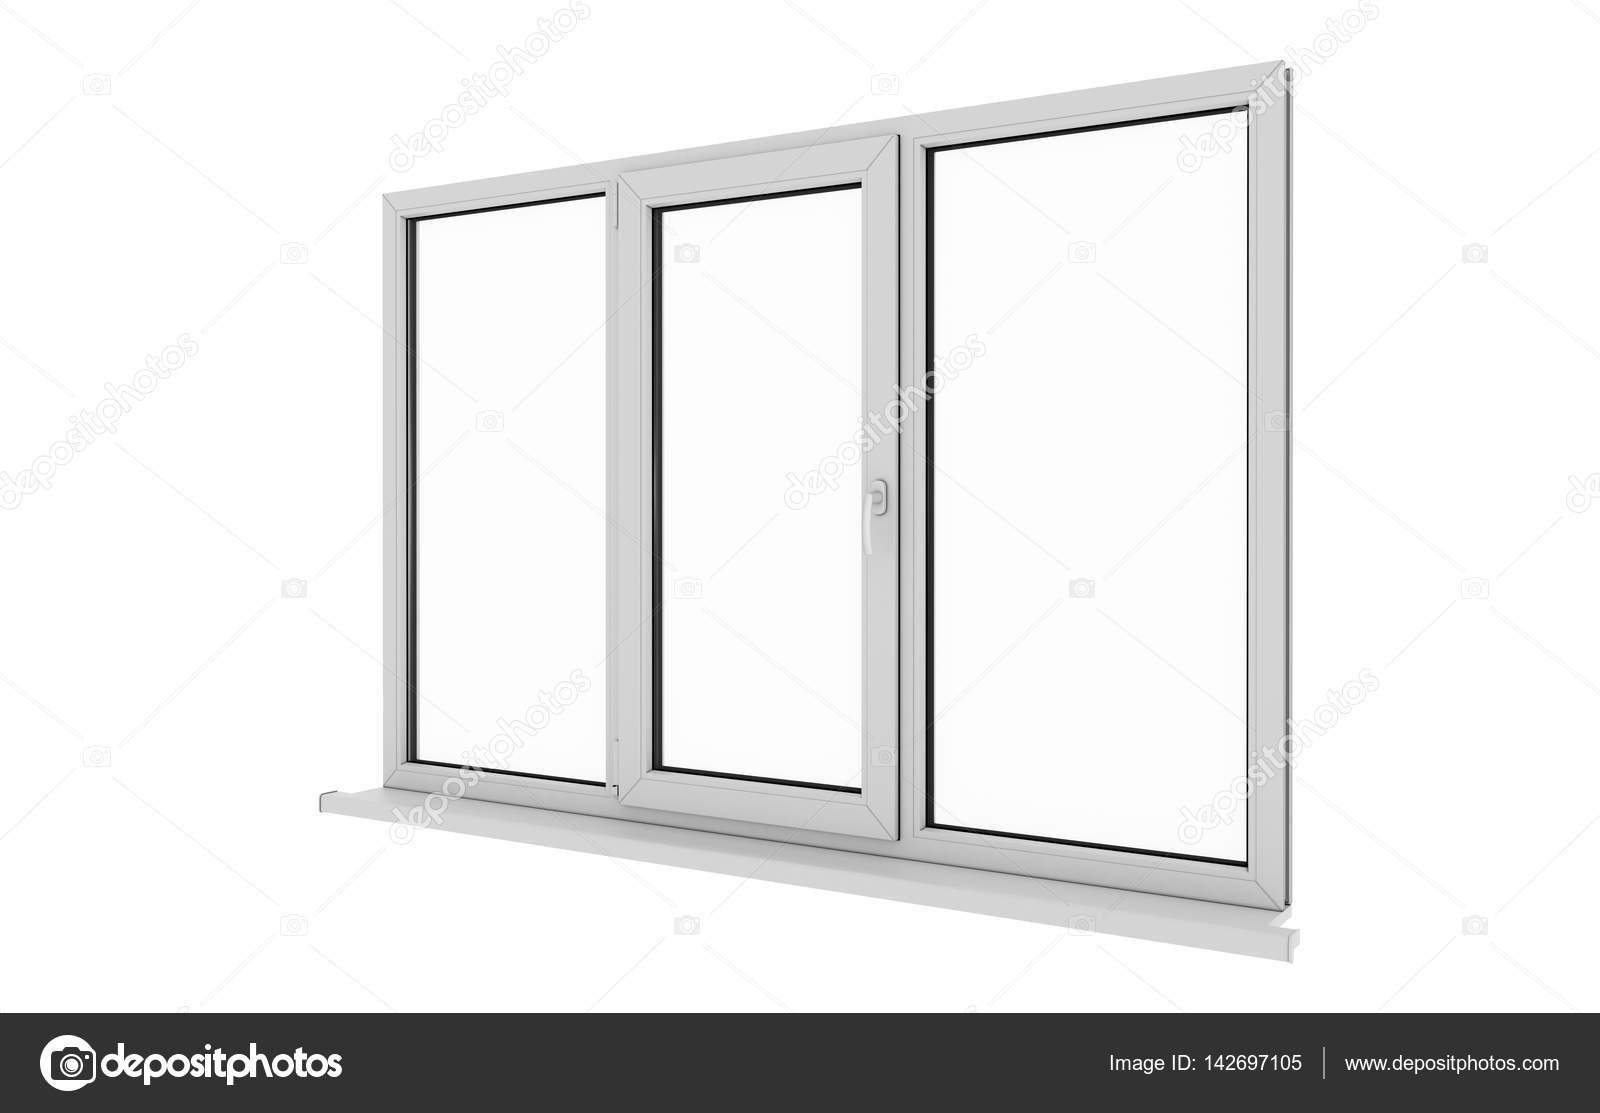 Fenster. Isolierte Fenster. Aluminium-Fenster. Weiße Fenster. PVC ...